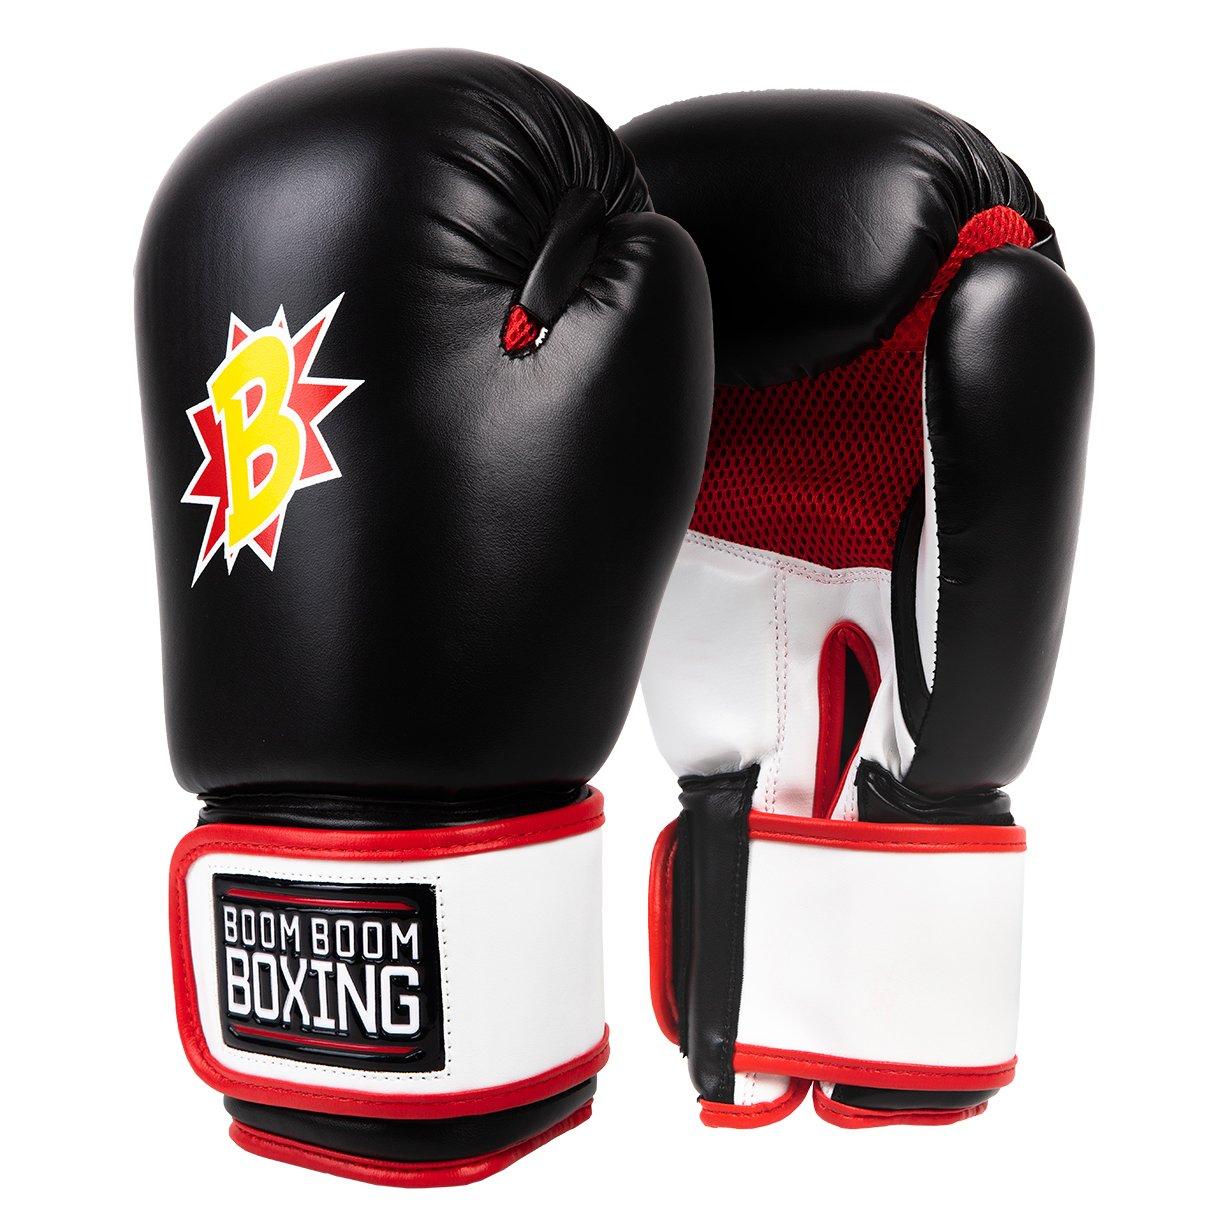 Boom Boom Boxing Bomberボクシンググローブ B07FQT3HWV 12 oz|ブラック/ホワイト/レッド ブラック/ホワイト/レッド 12 oz